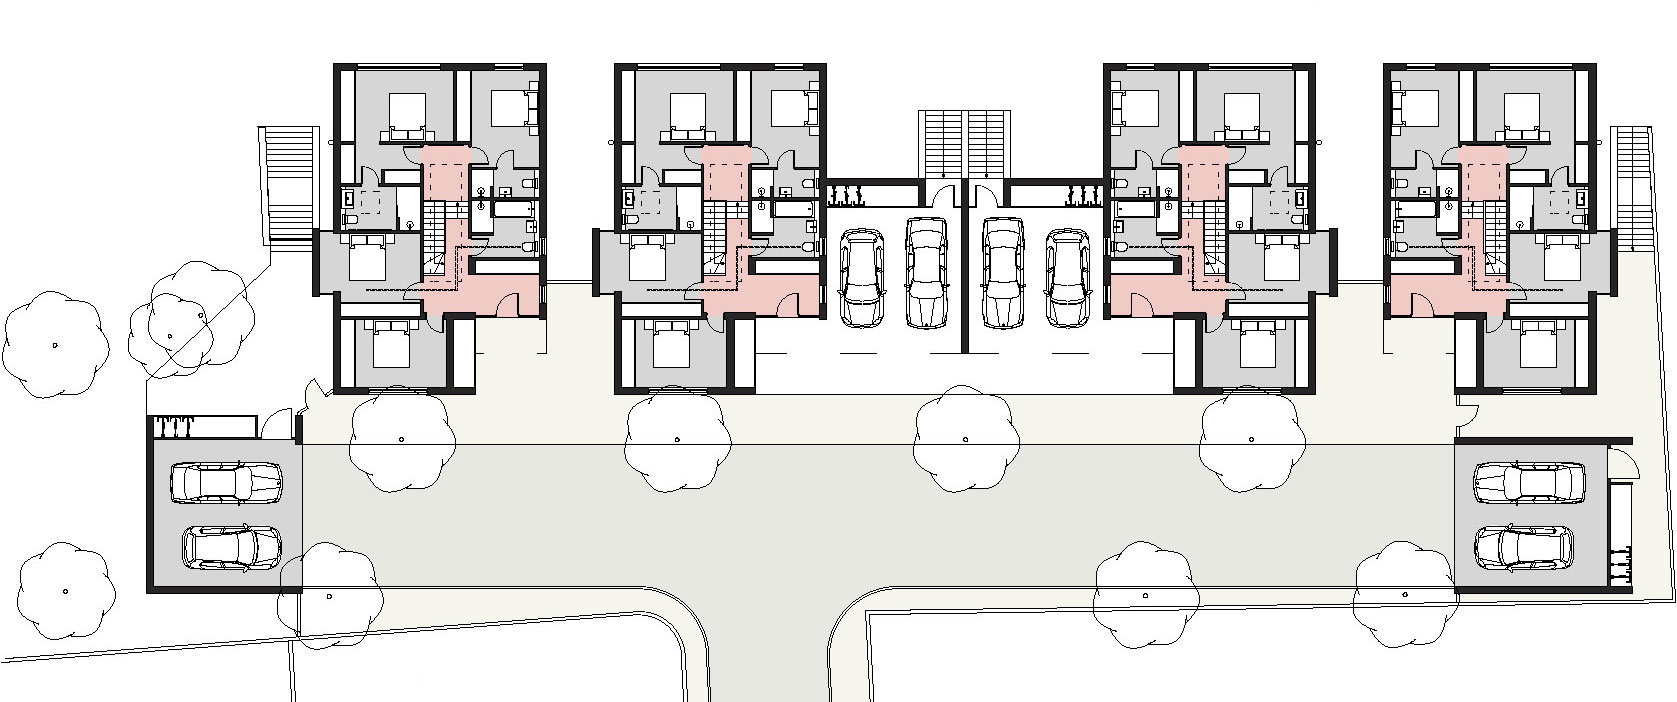 proposed ground floor plans dwellings 1-4